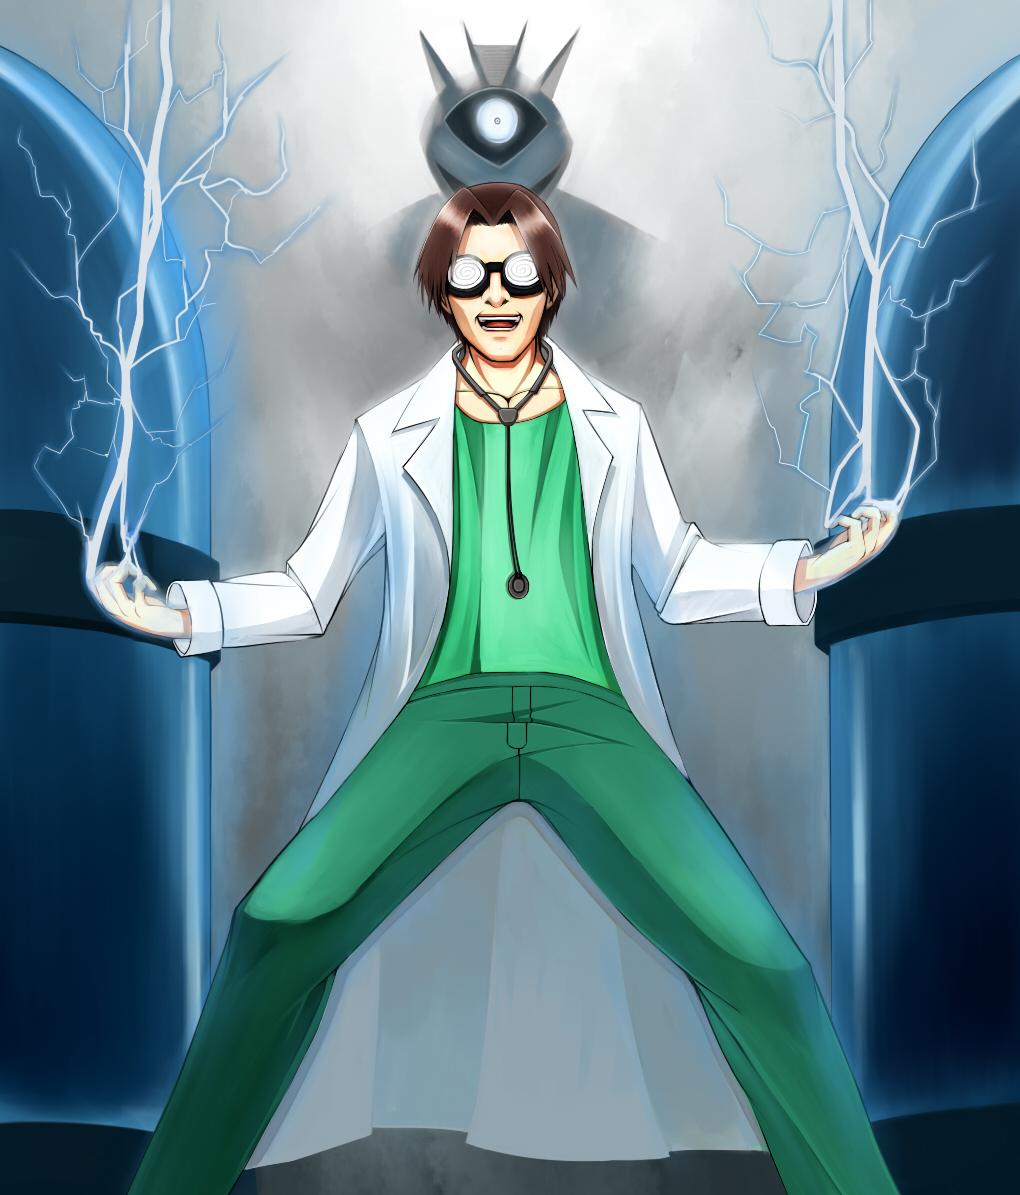 Dr Insano by Metalbolic